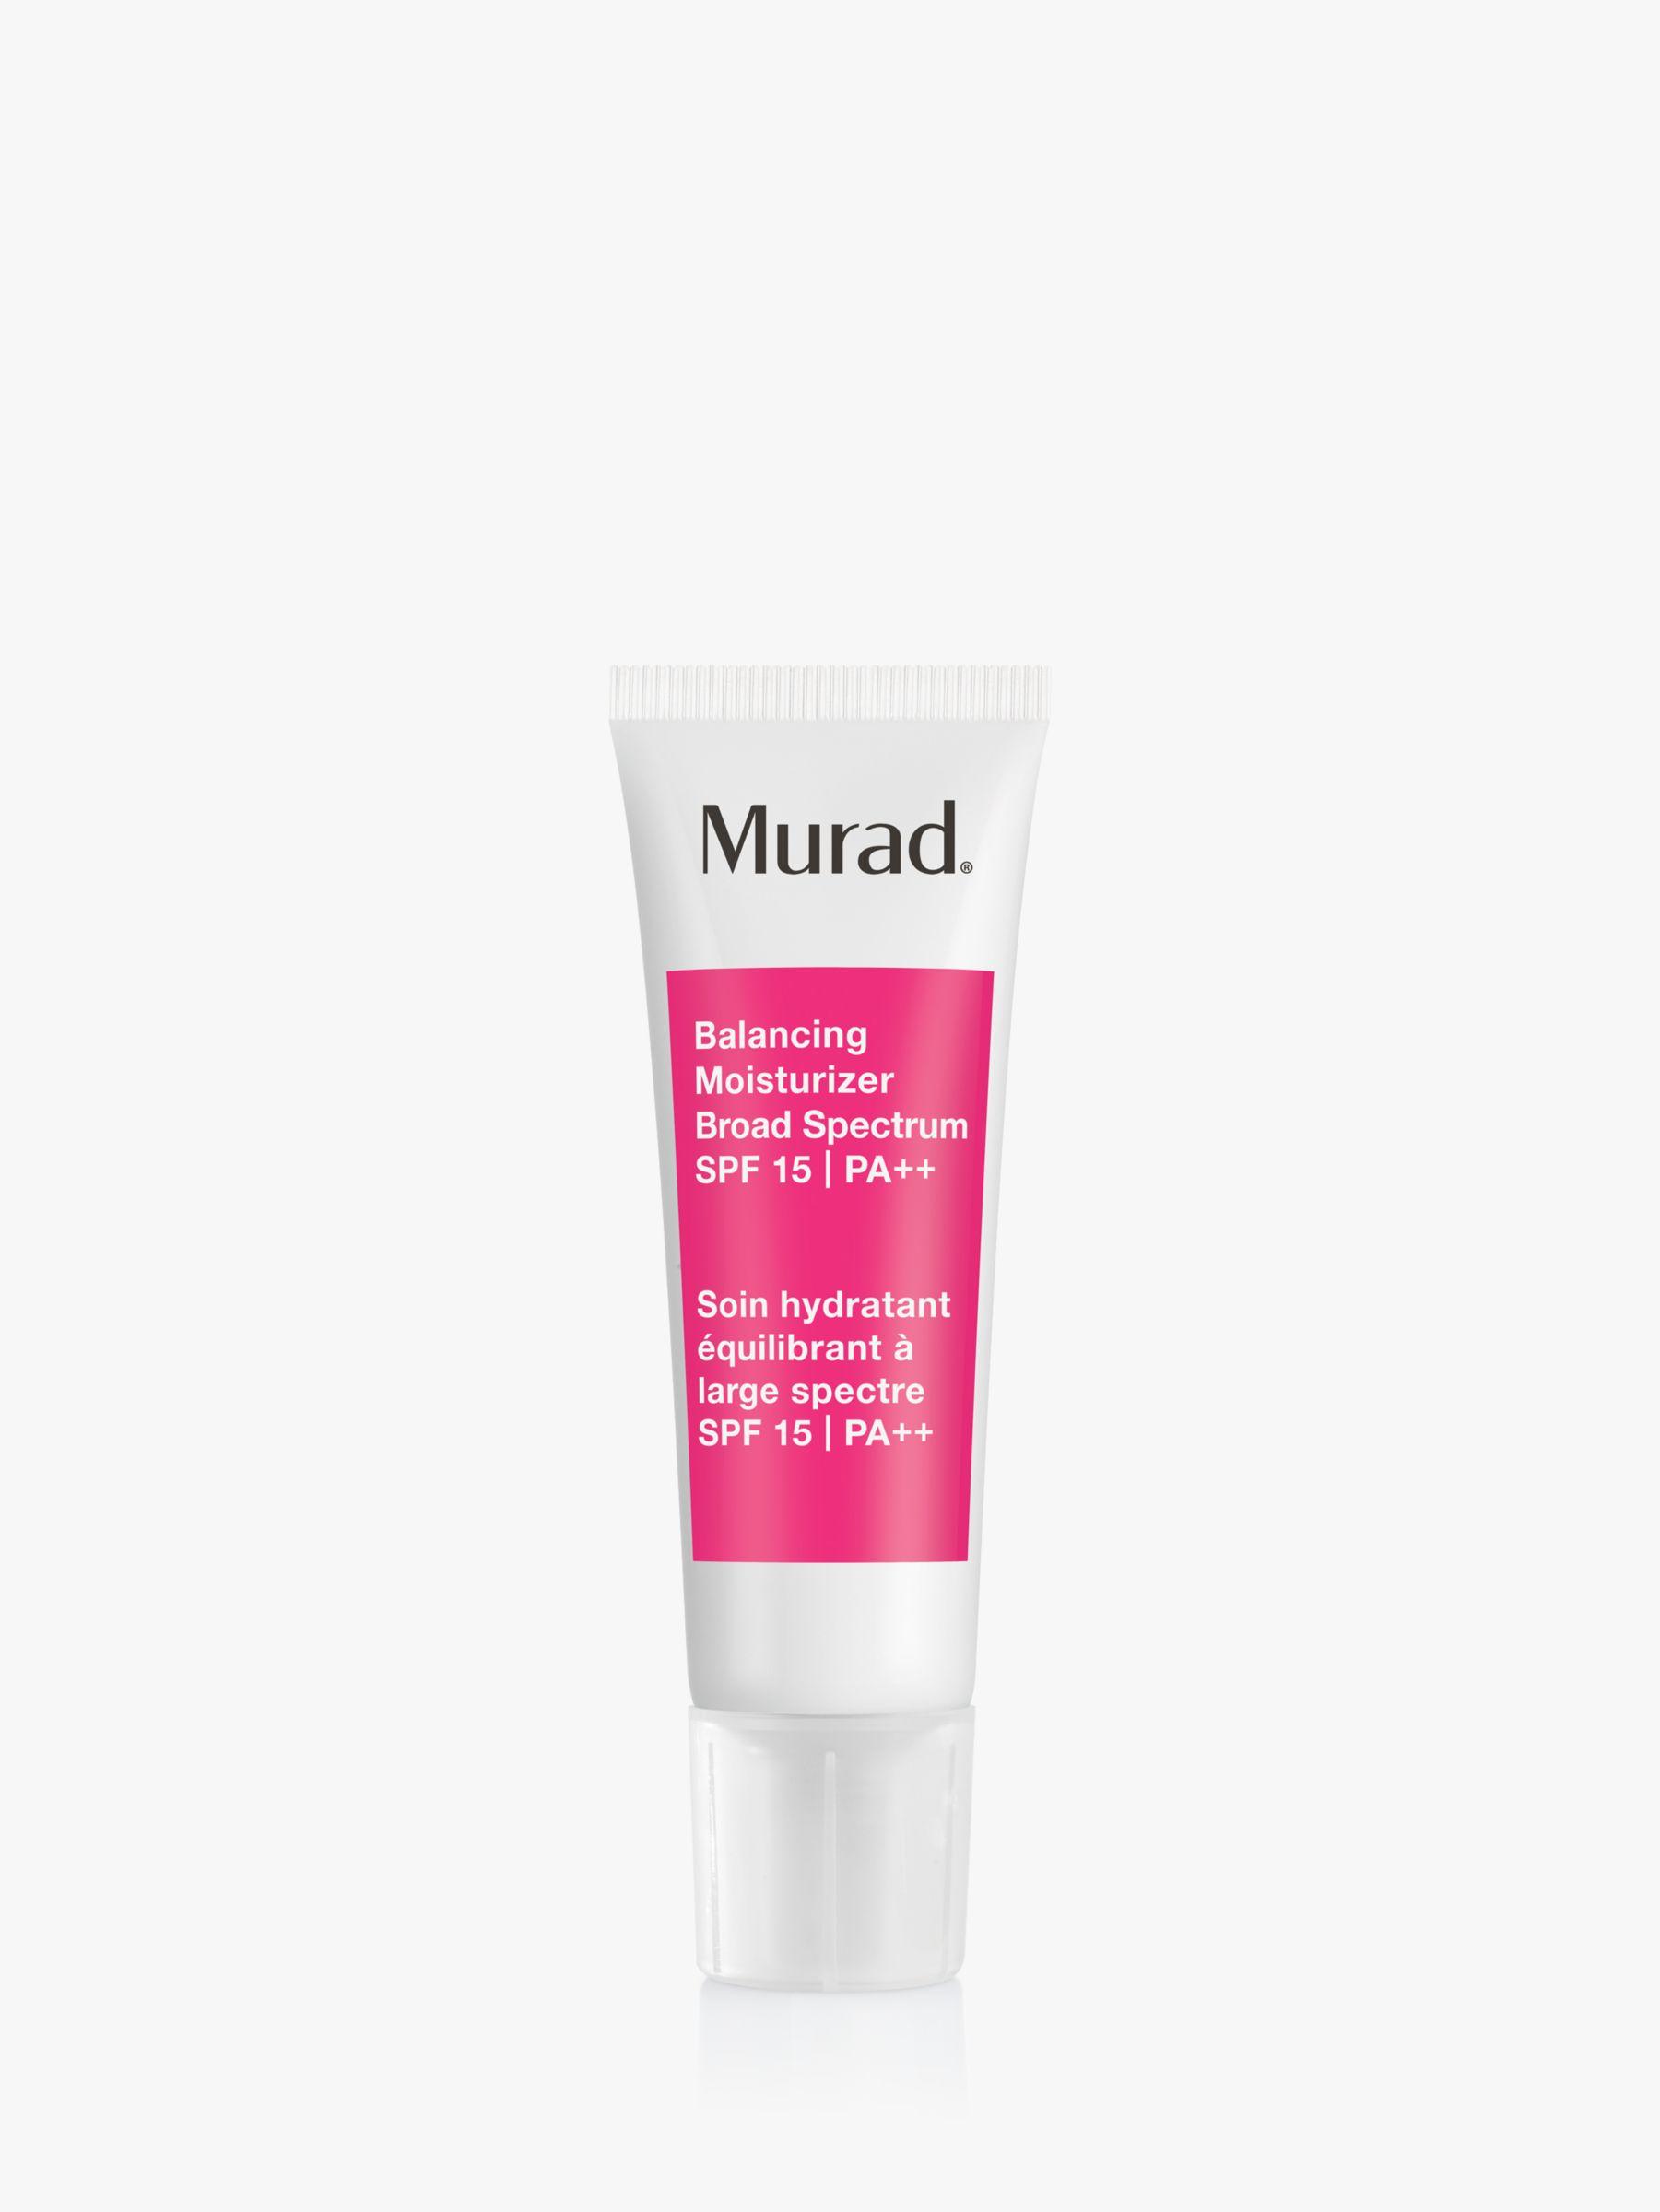 Murad Murad Balancing Moisturising Broad Spectrum 15 PA++, 50ml